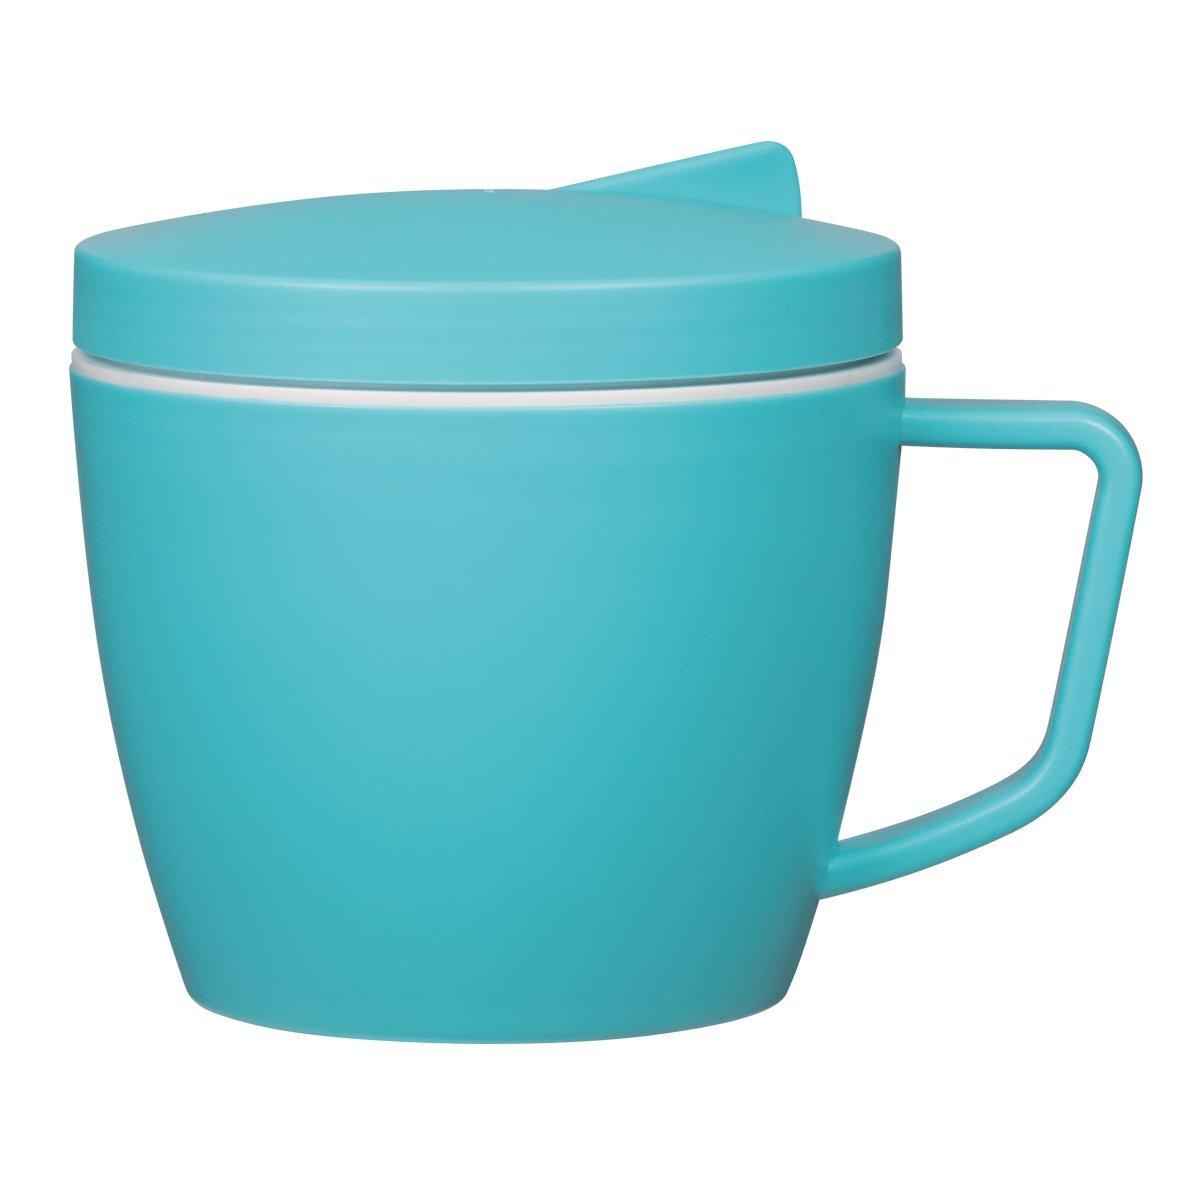 Thermal Mug w/ Spoon & Fork Set, 14 oz.